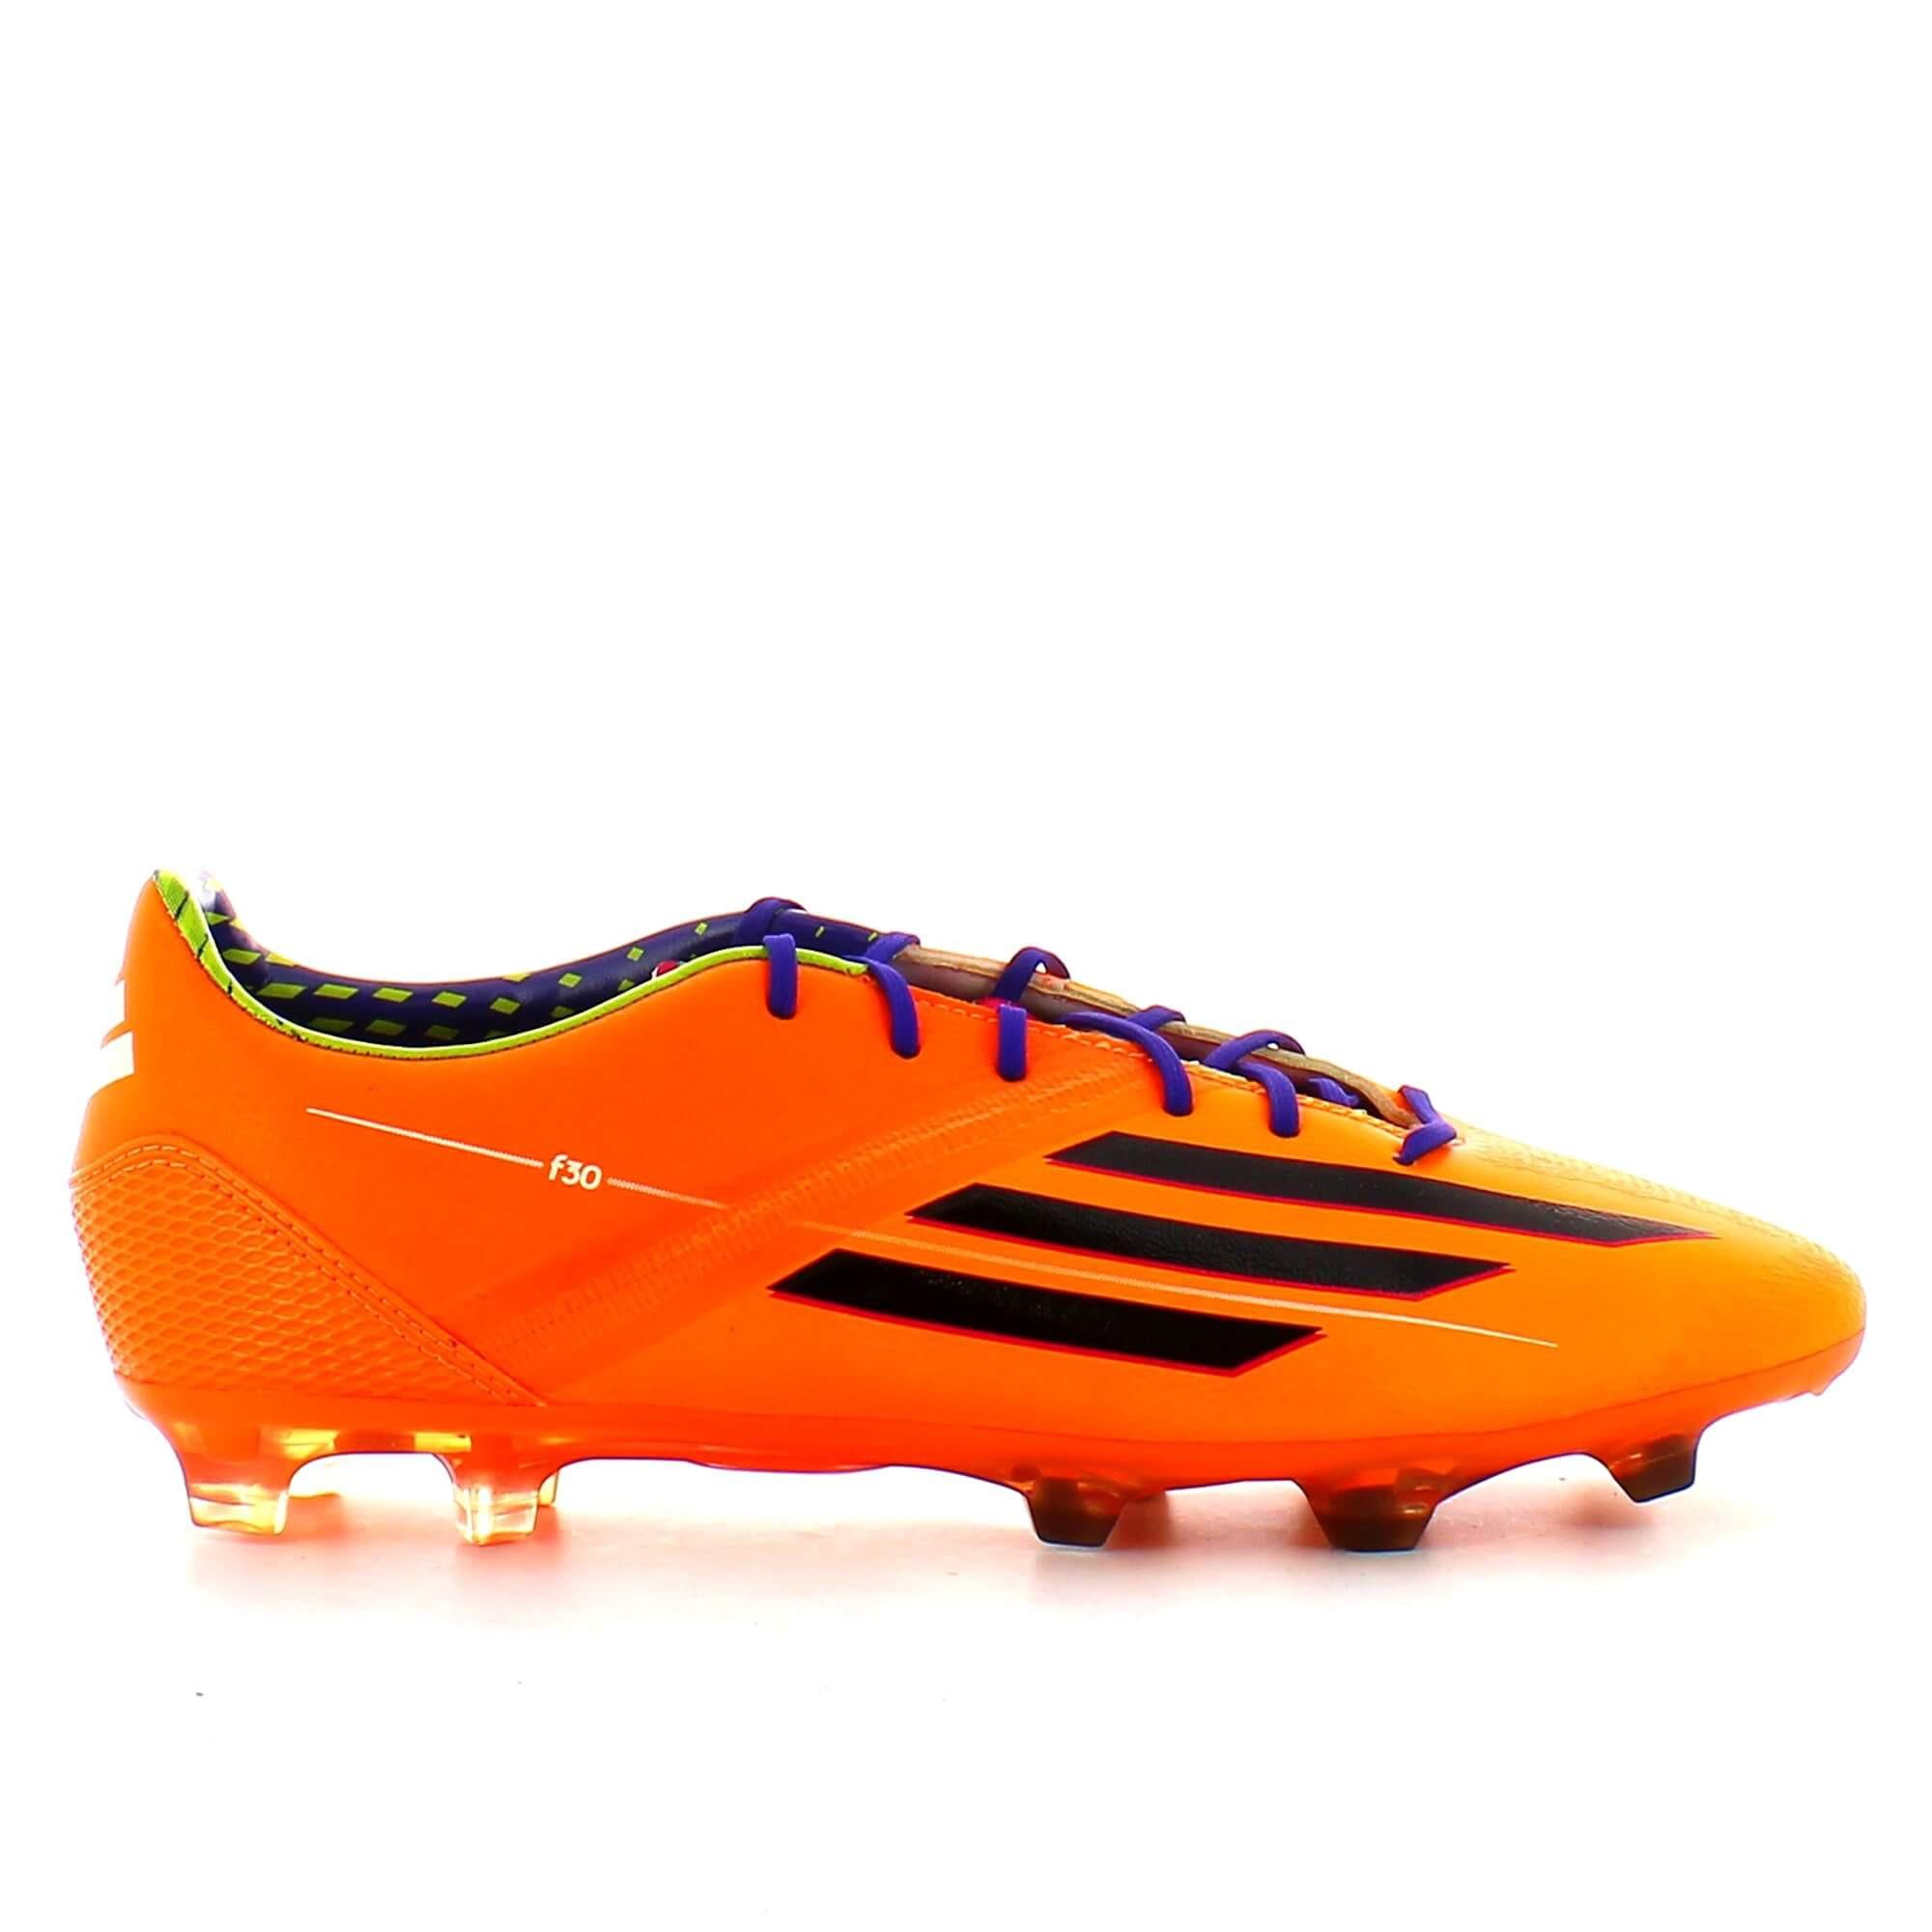 online retailer c6757 82b32 Naranja Fútbol F30 Trx Zapatilla Moya Hombre Adidas Fg Deportes RqUWFw